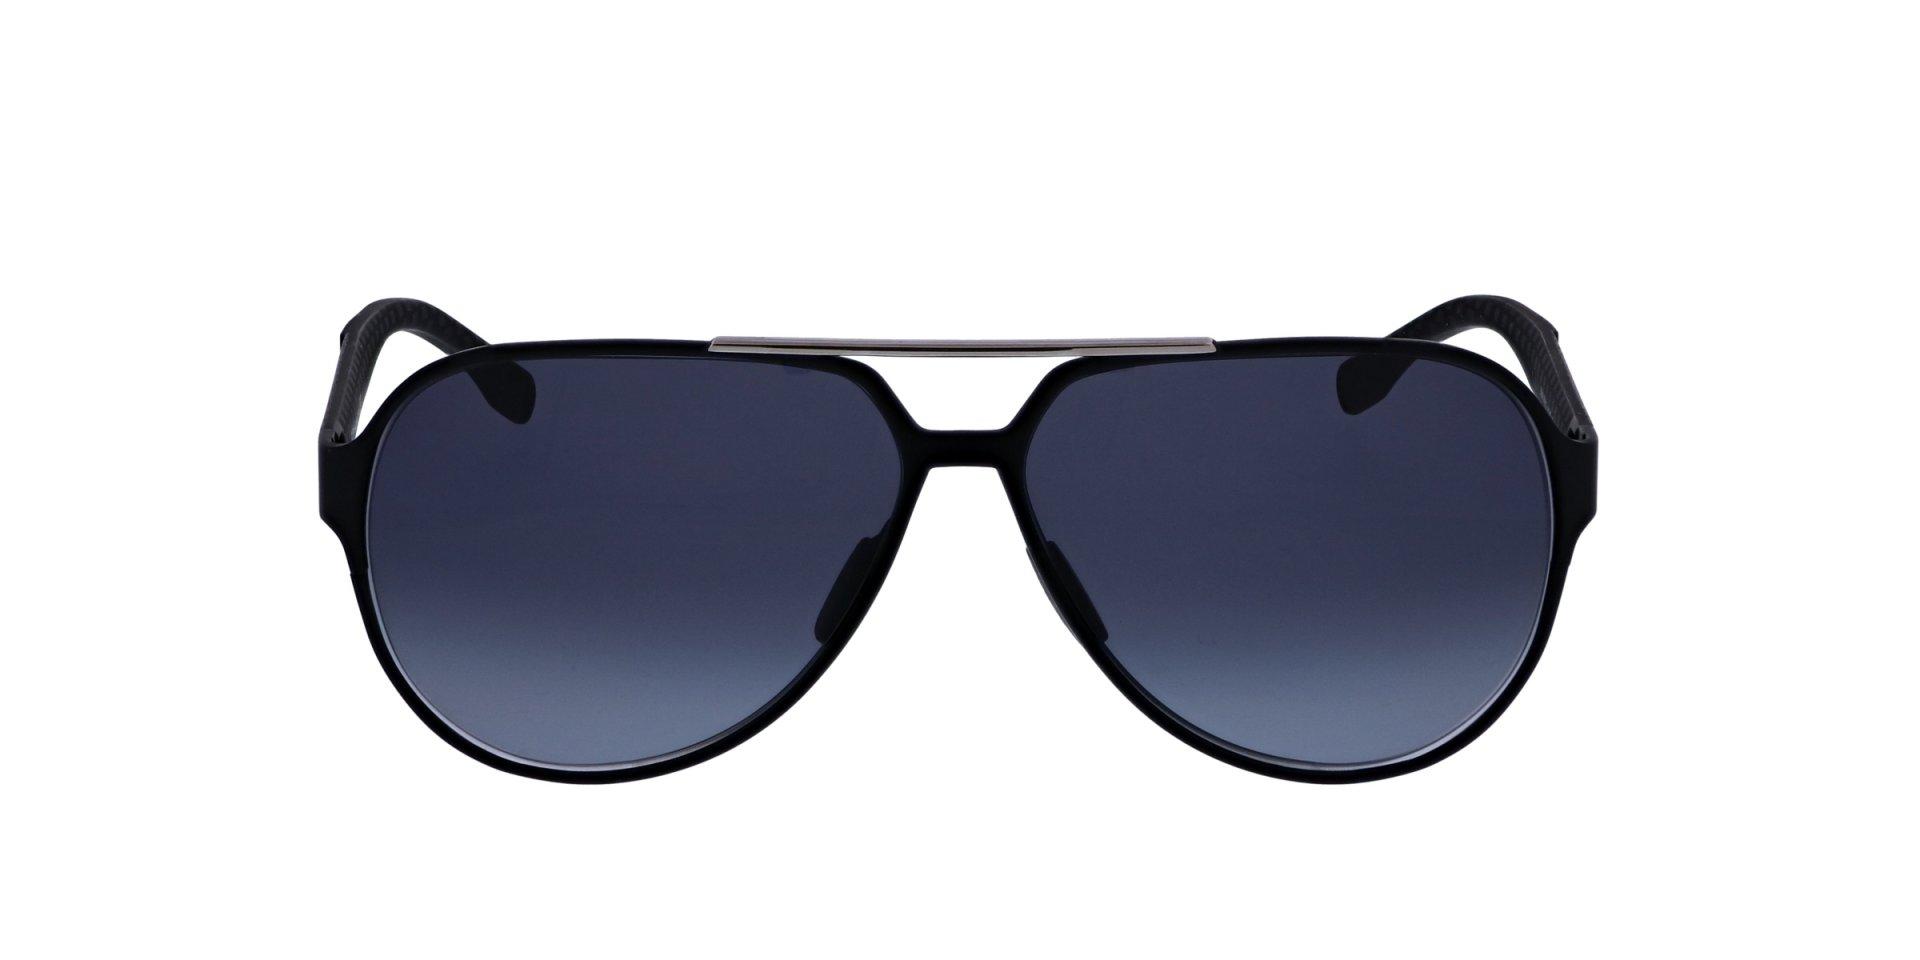 3089f78bbc1227 Sunglasses HUGO BOSS   Opticlasa